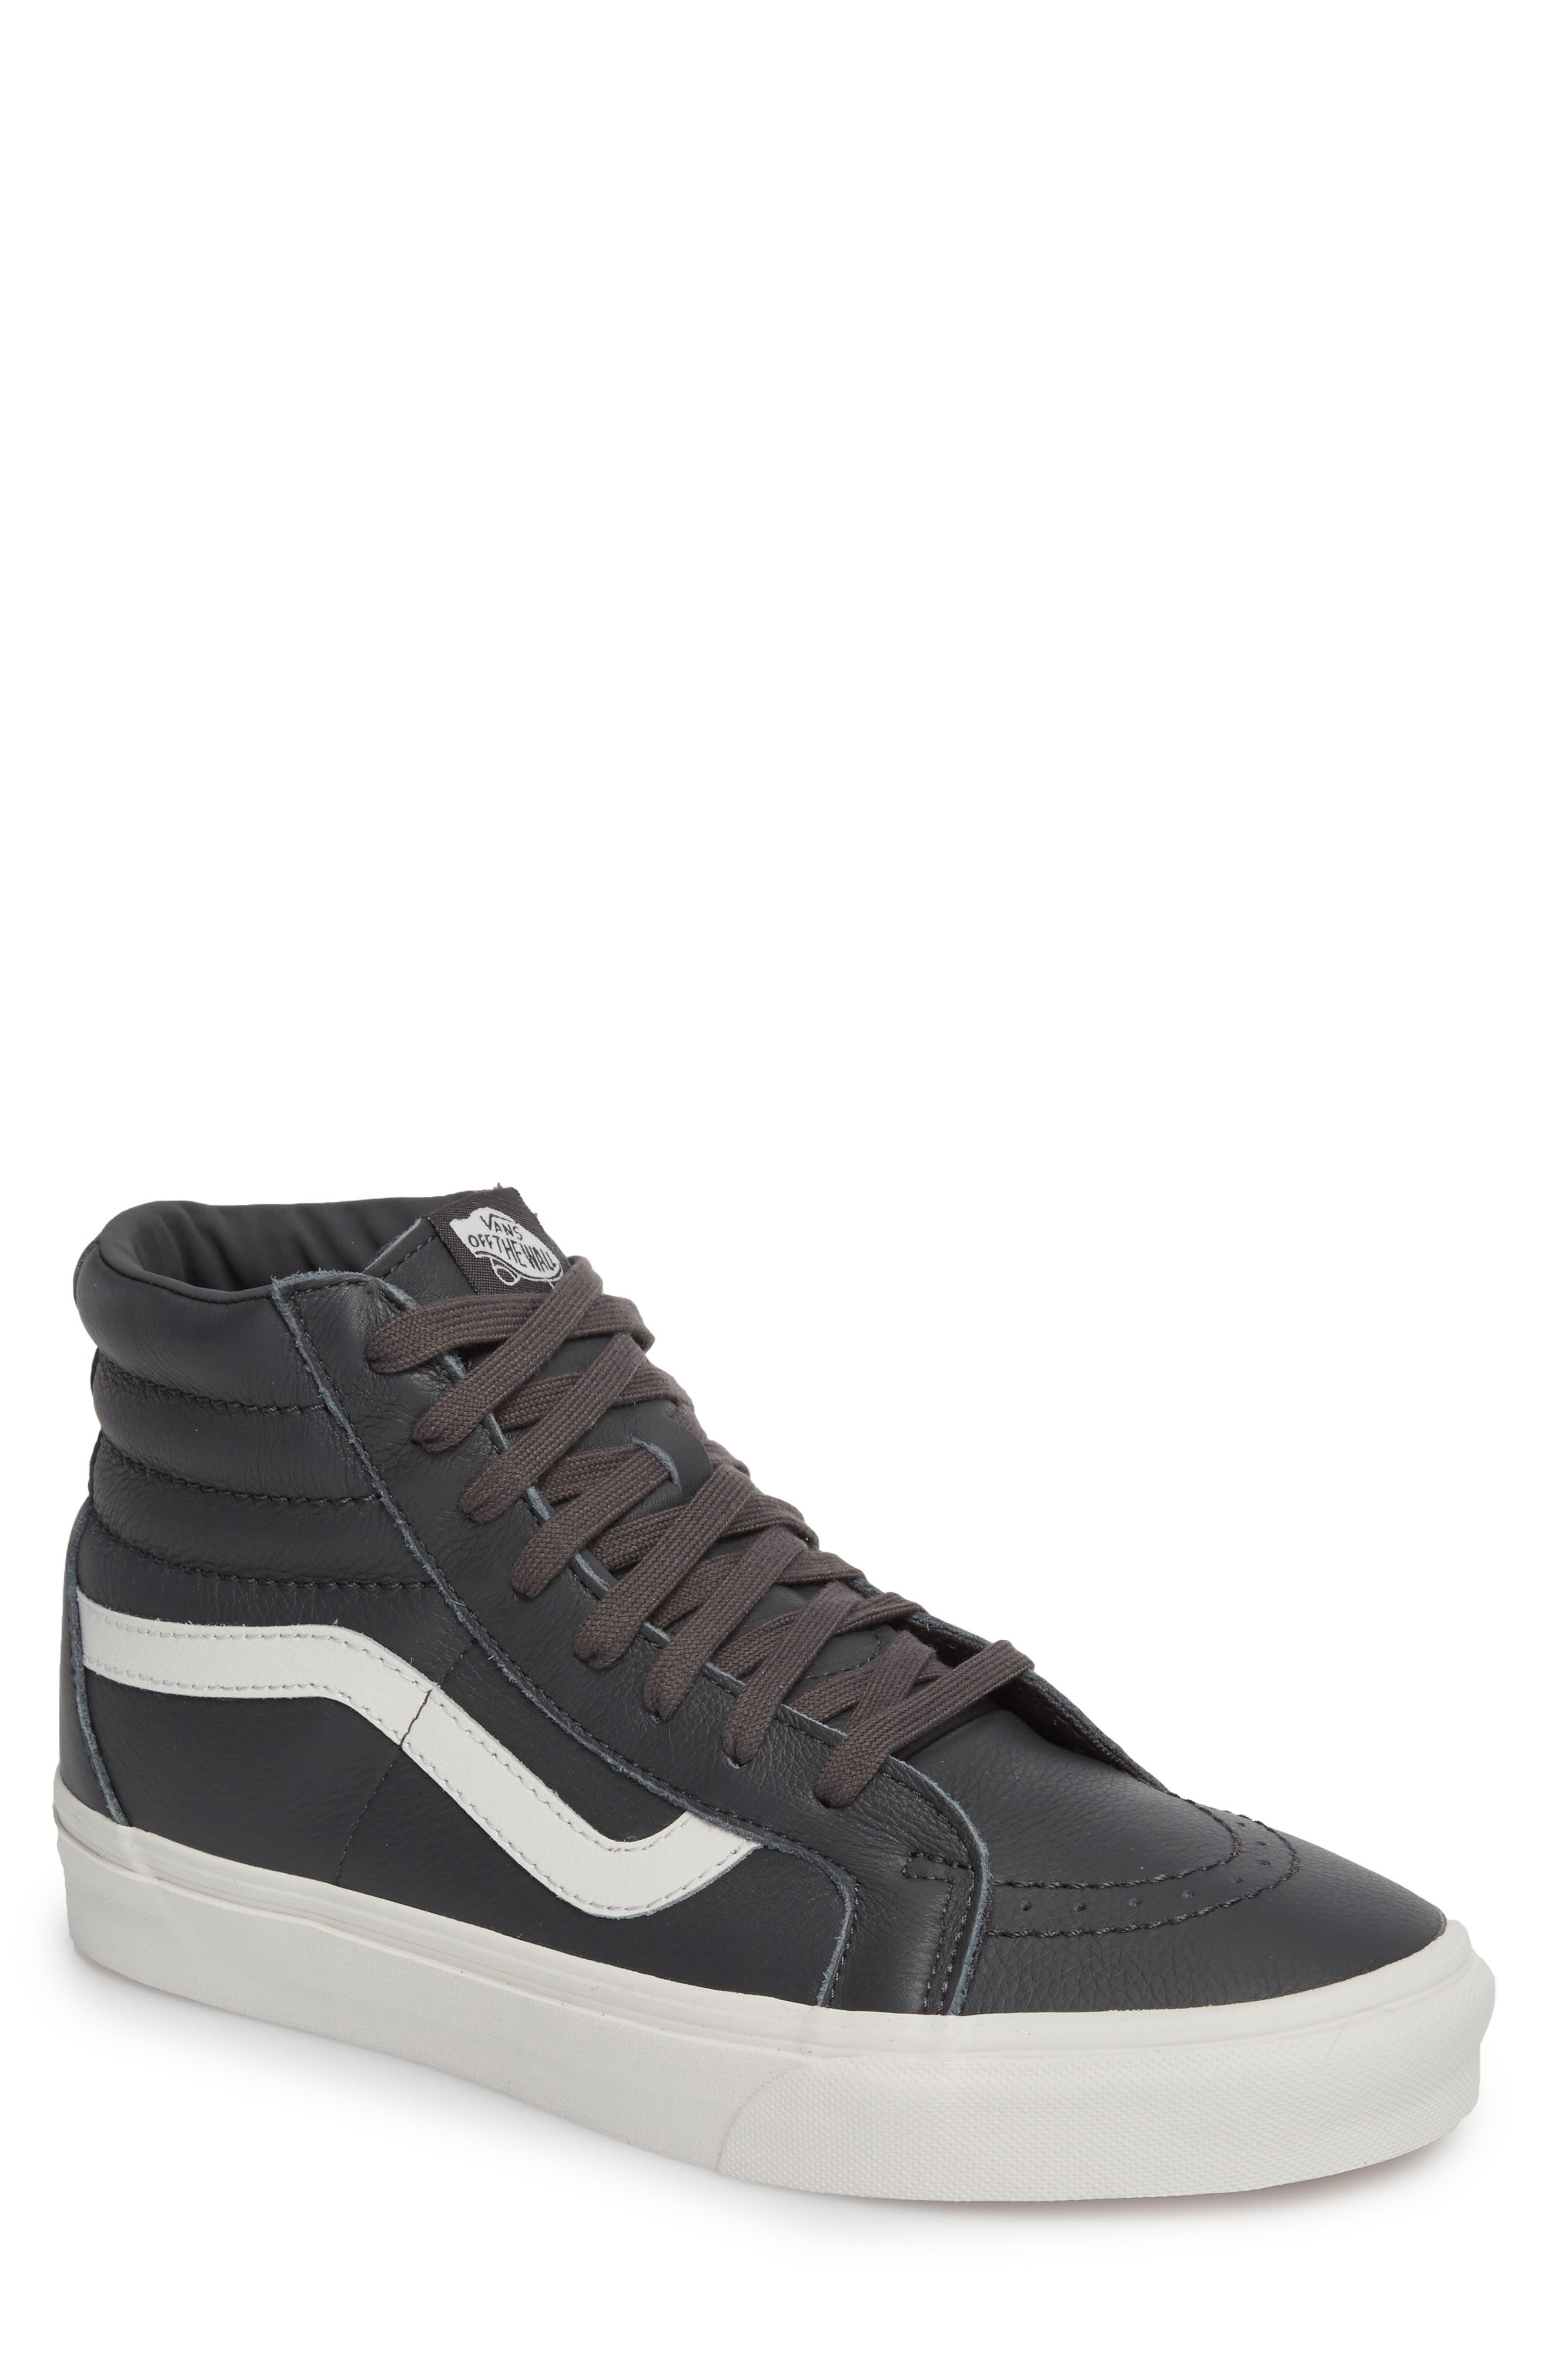 Vans Sk8-Hi Reissue Leather Sneaker (Men)